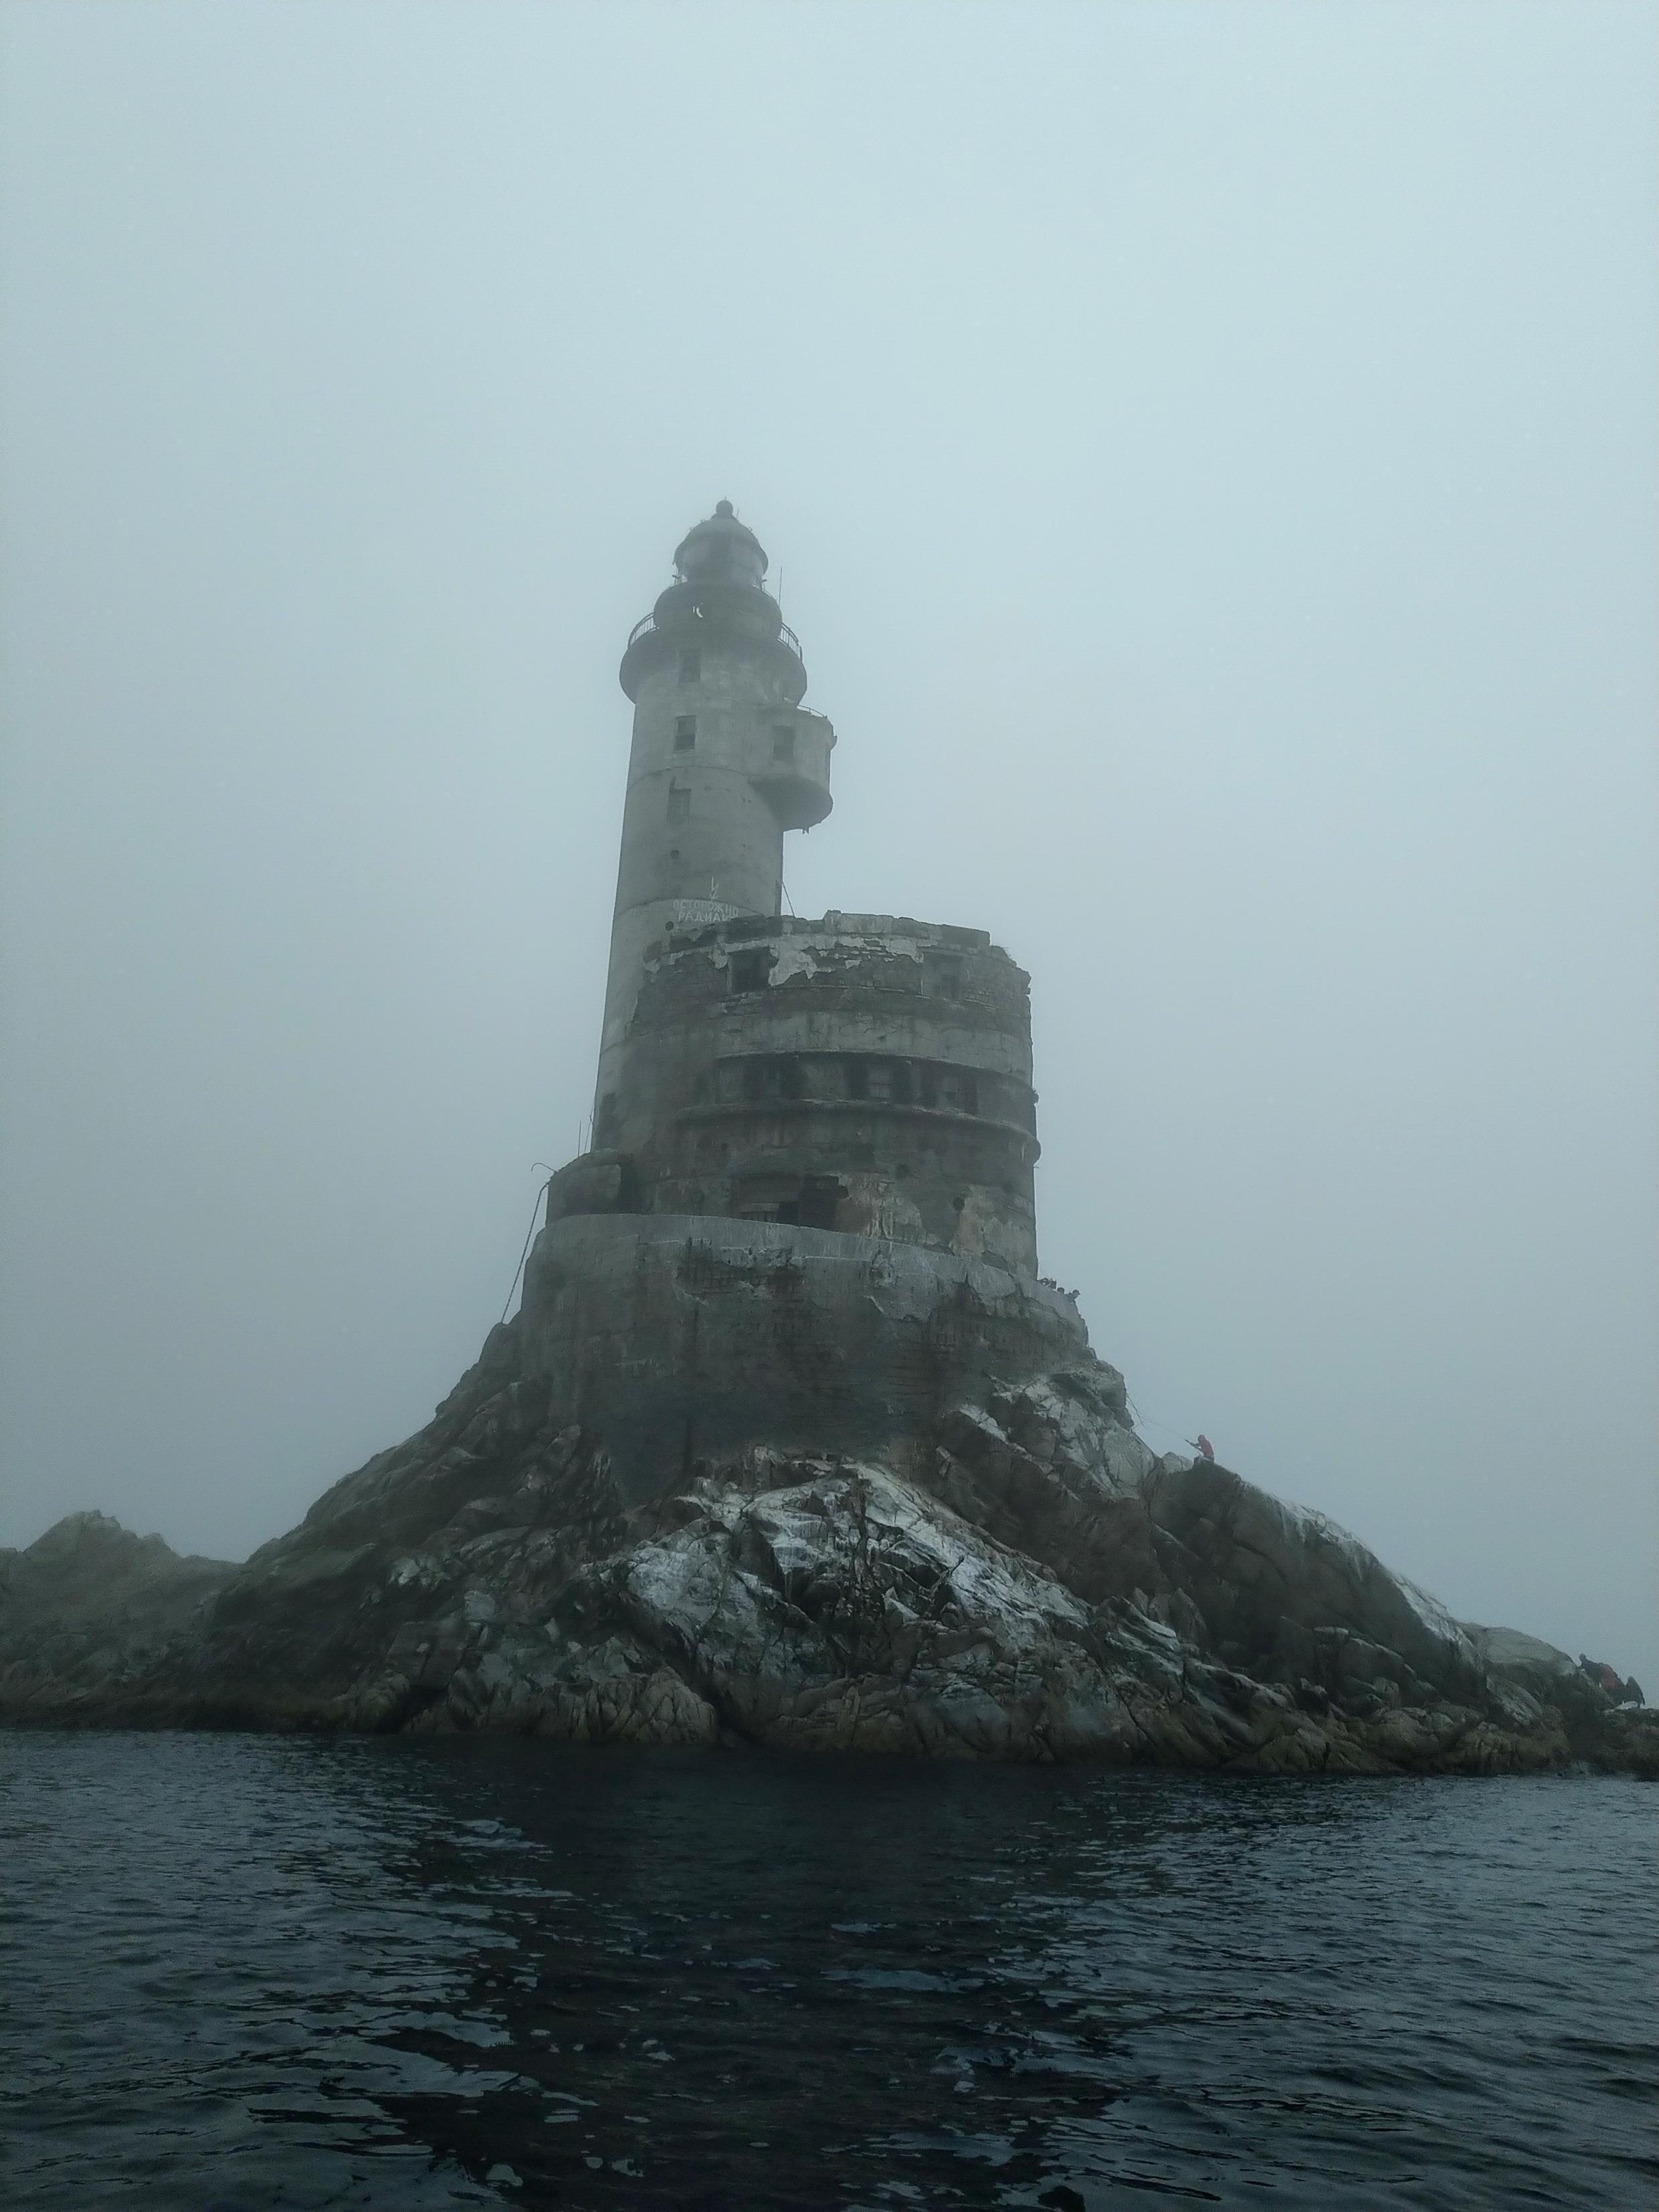 Маяк на мысе Анива острова Сахалин, на скале Сивучья. Высота башни составляет 31 метр